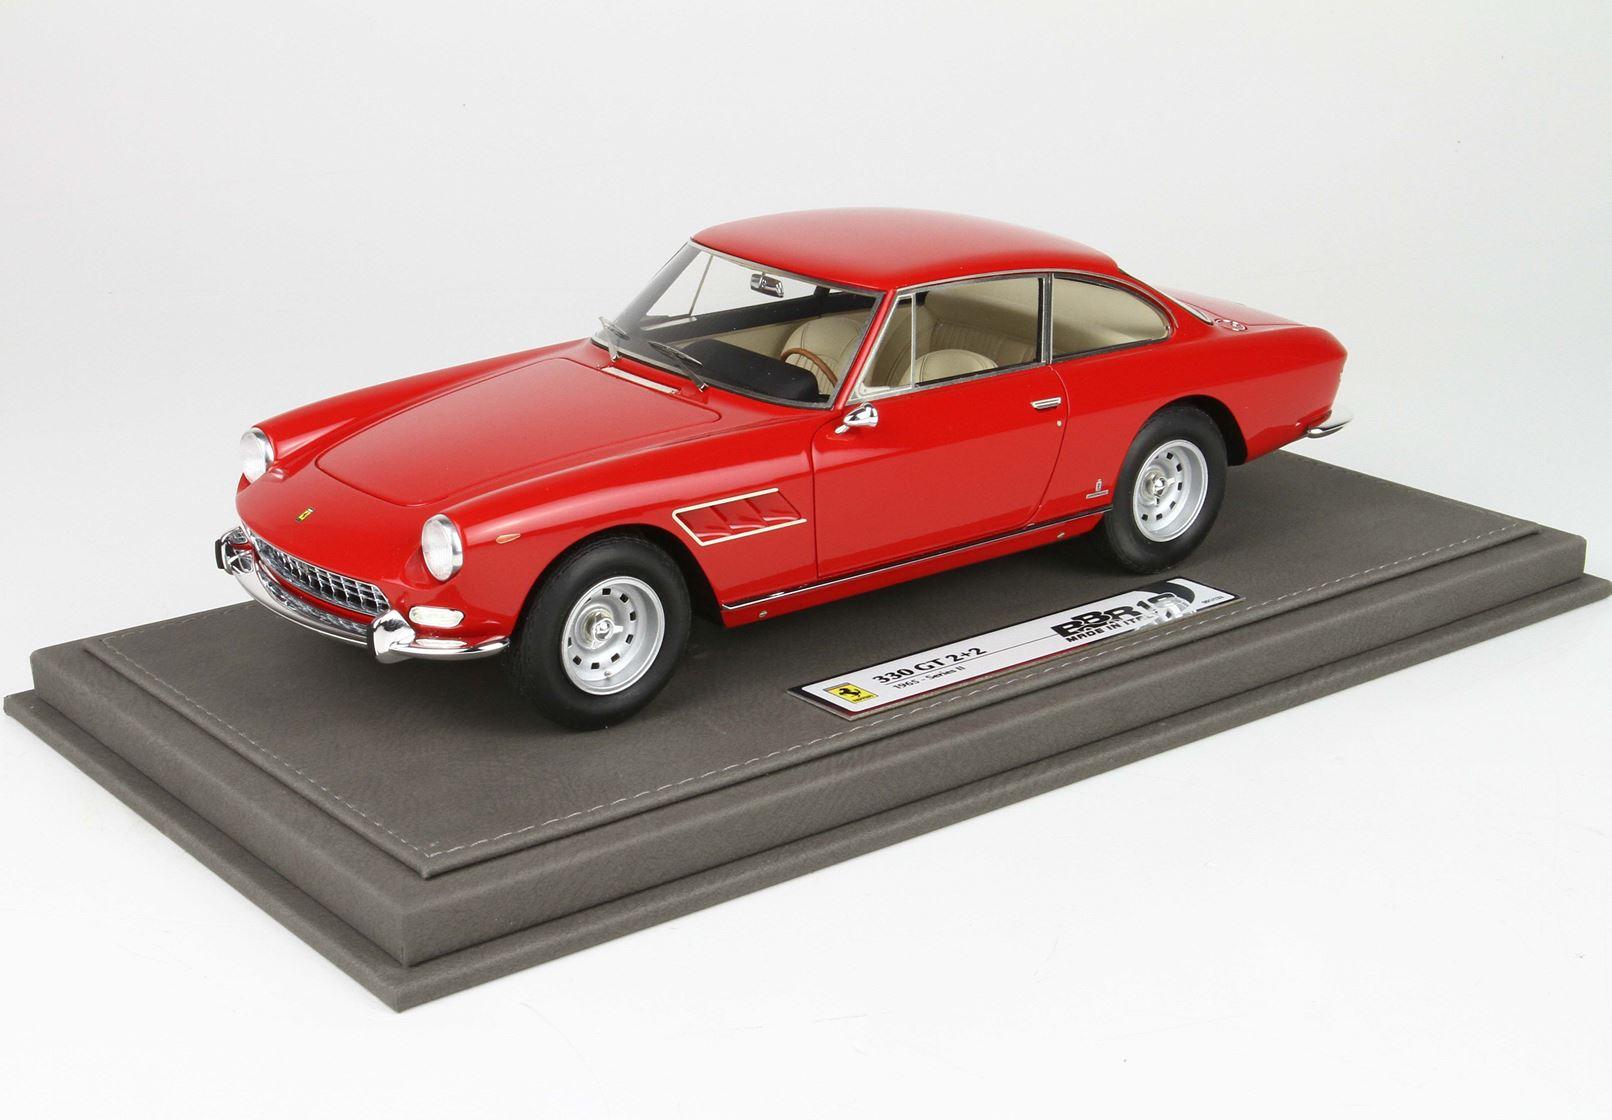 Bbr Ferrari 330 Gt 2 2 Series 2 1965 Single Light Rosso Corsa 300 1 18 Limited Edition 133 Hansecars Modellautos Hansecars Exklusive Sammlermodelle